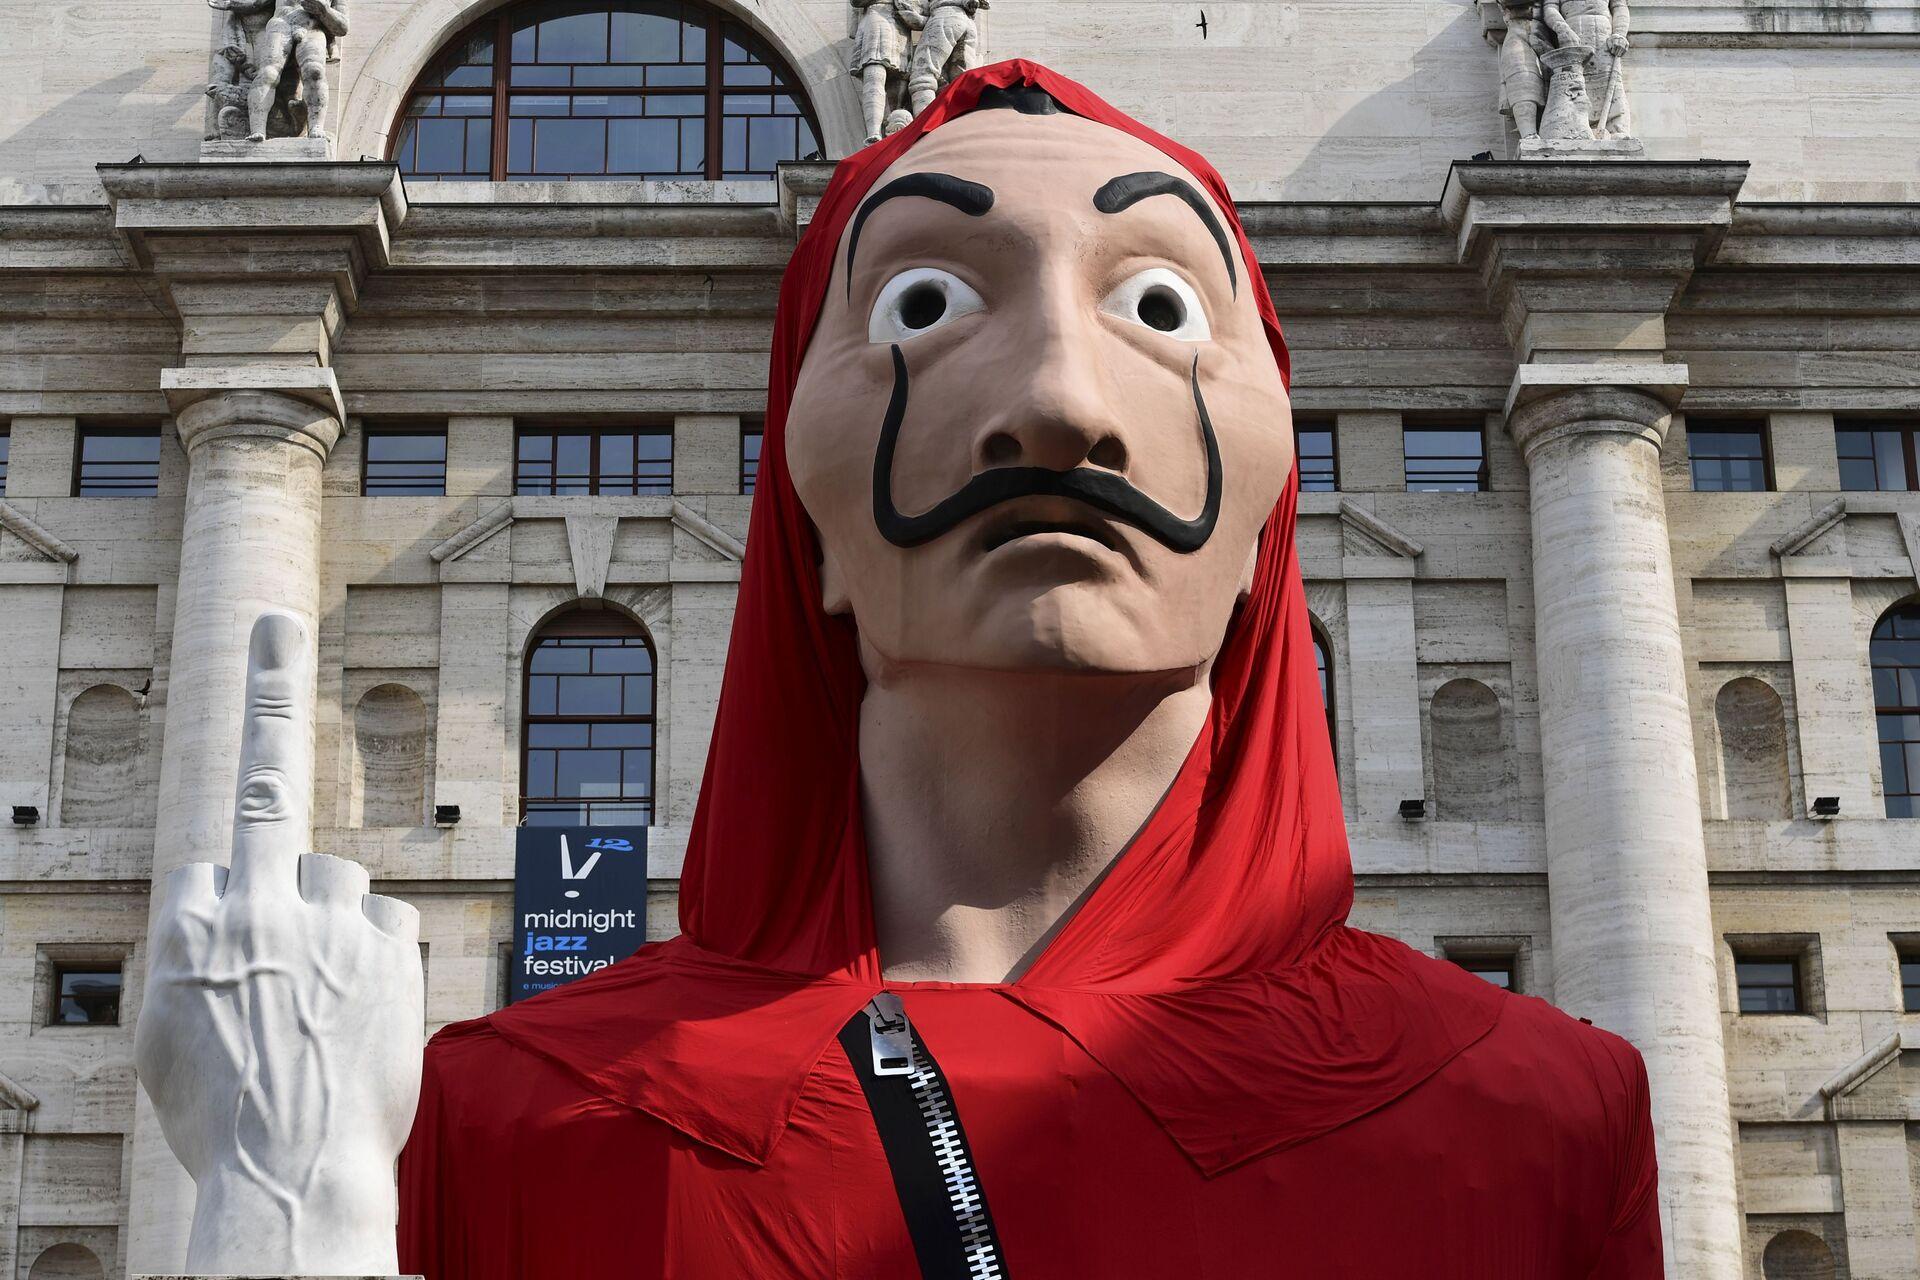 La máscara de Dalí popularizada por la serie 'La casa de papel' - Sputnik Mundo, 1920, 03.09.2021